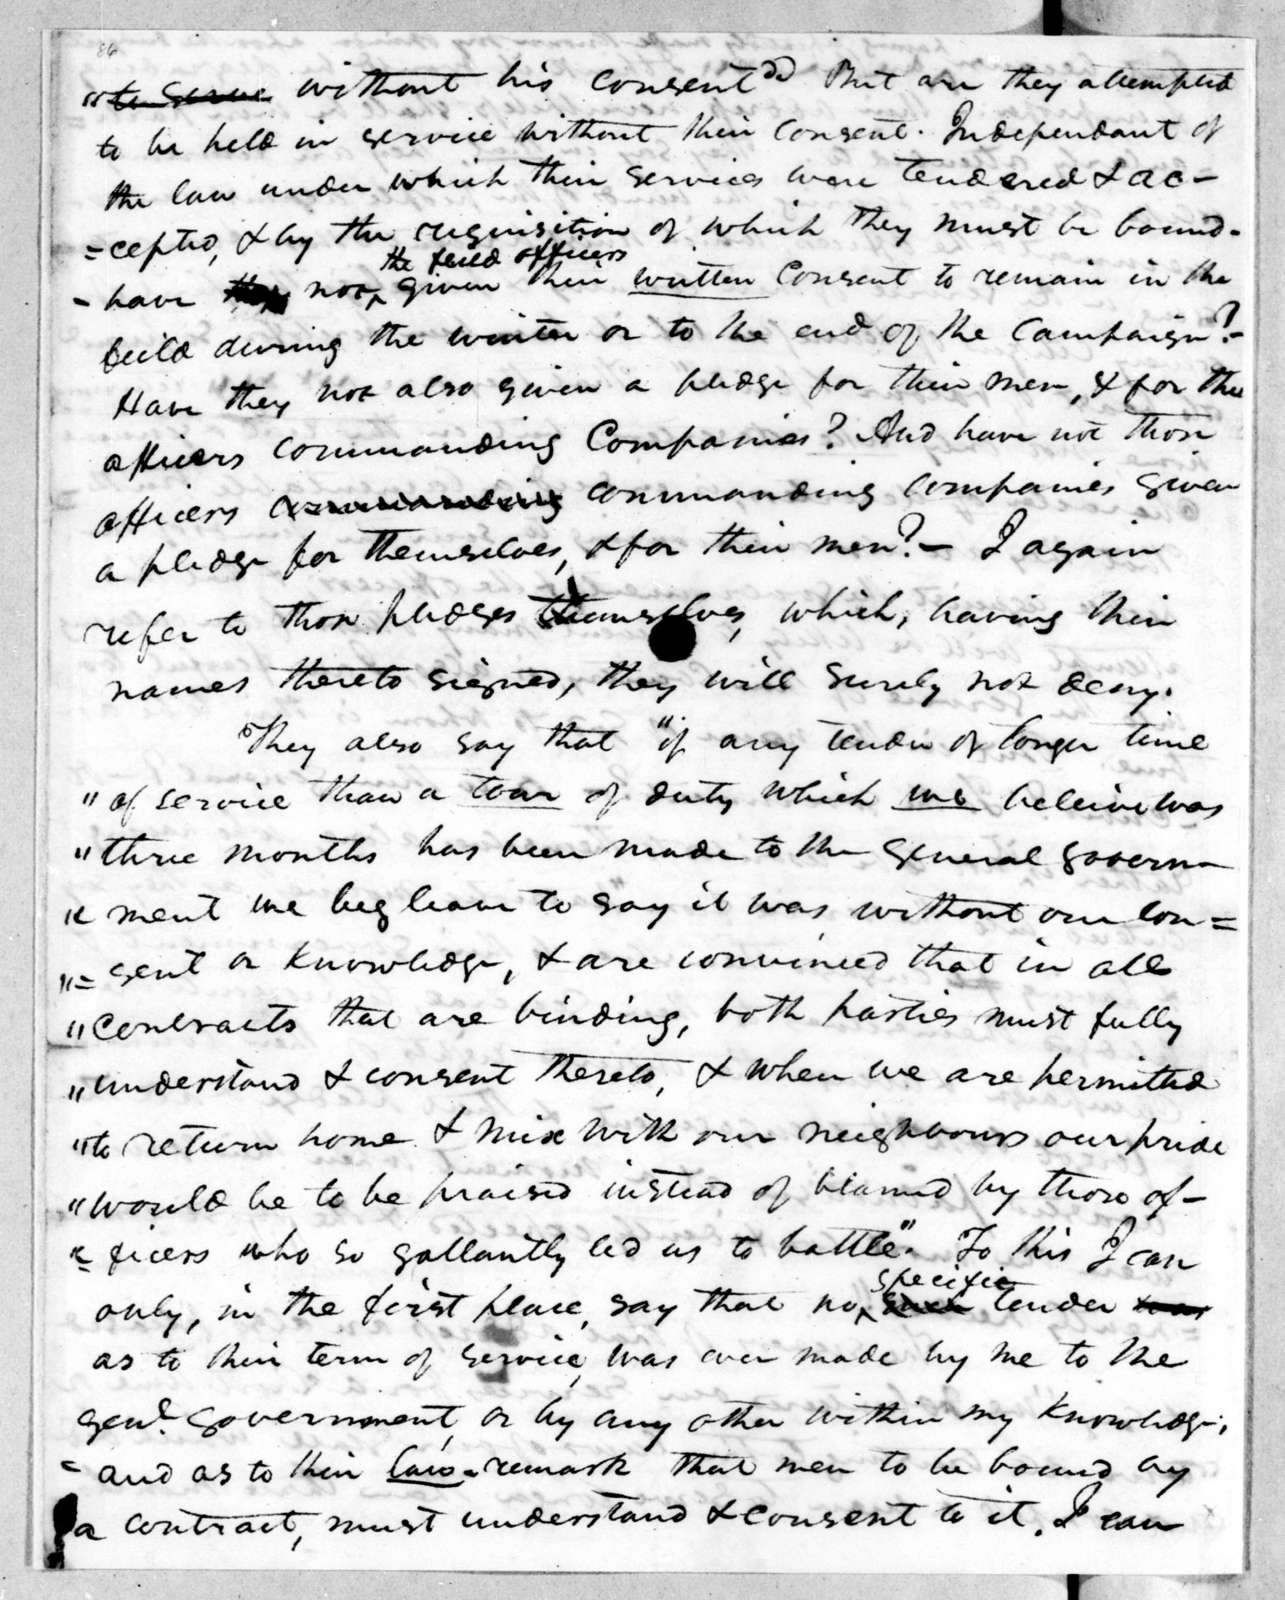 Andrew Jackson to John Coffee, December 25, 1813